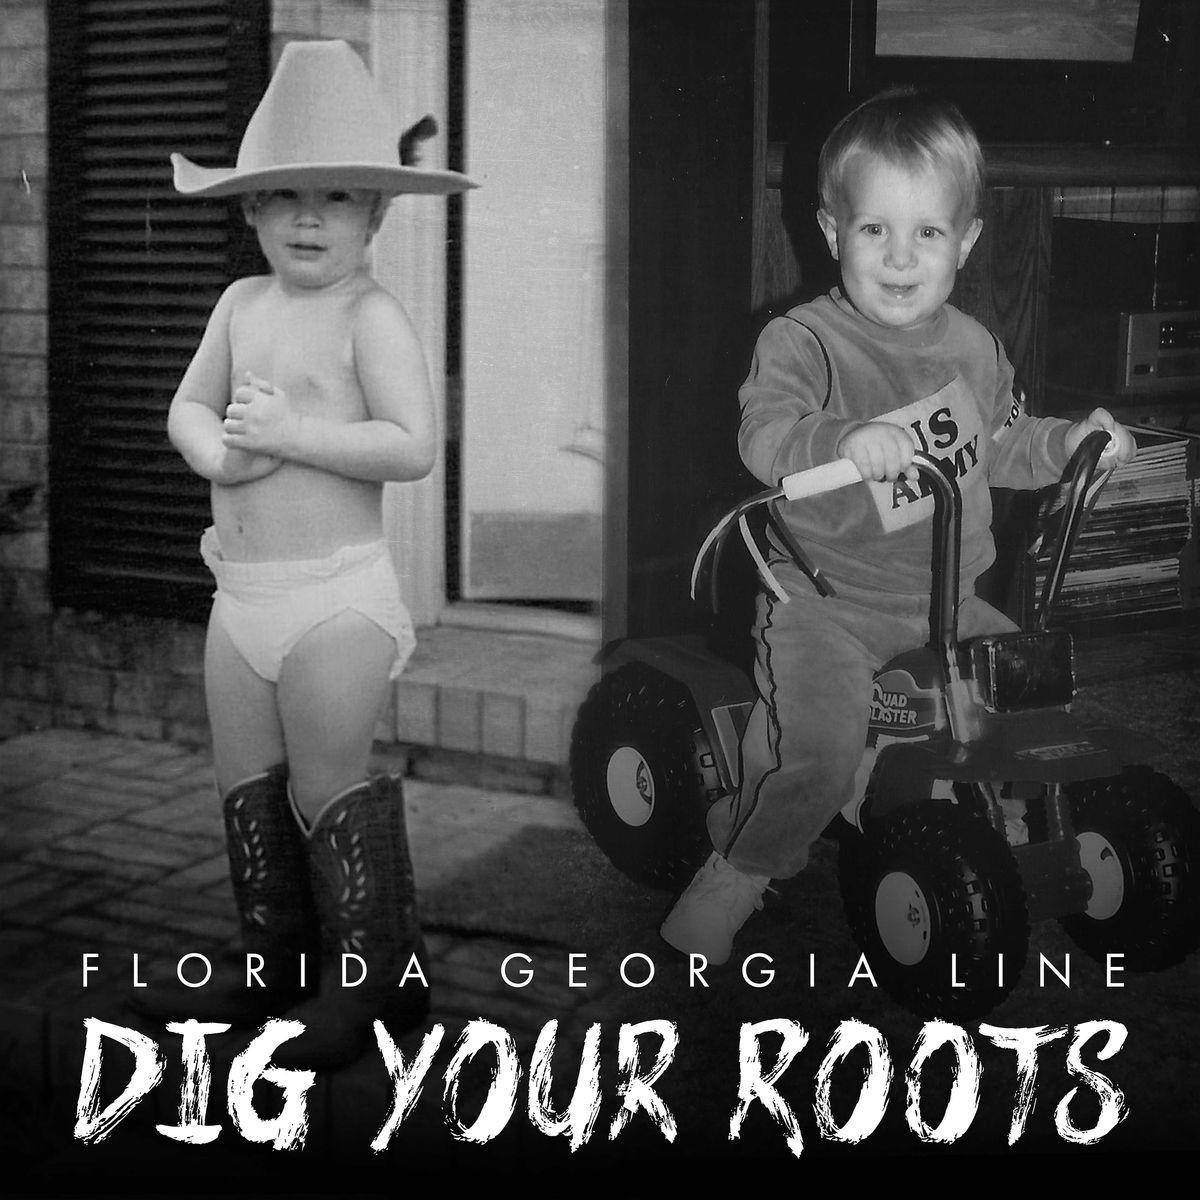 florida georgia line dig your roots album download free